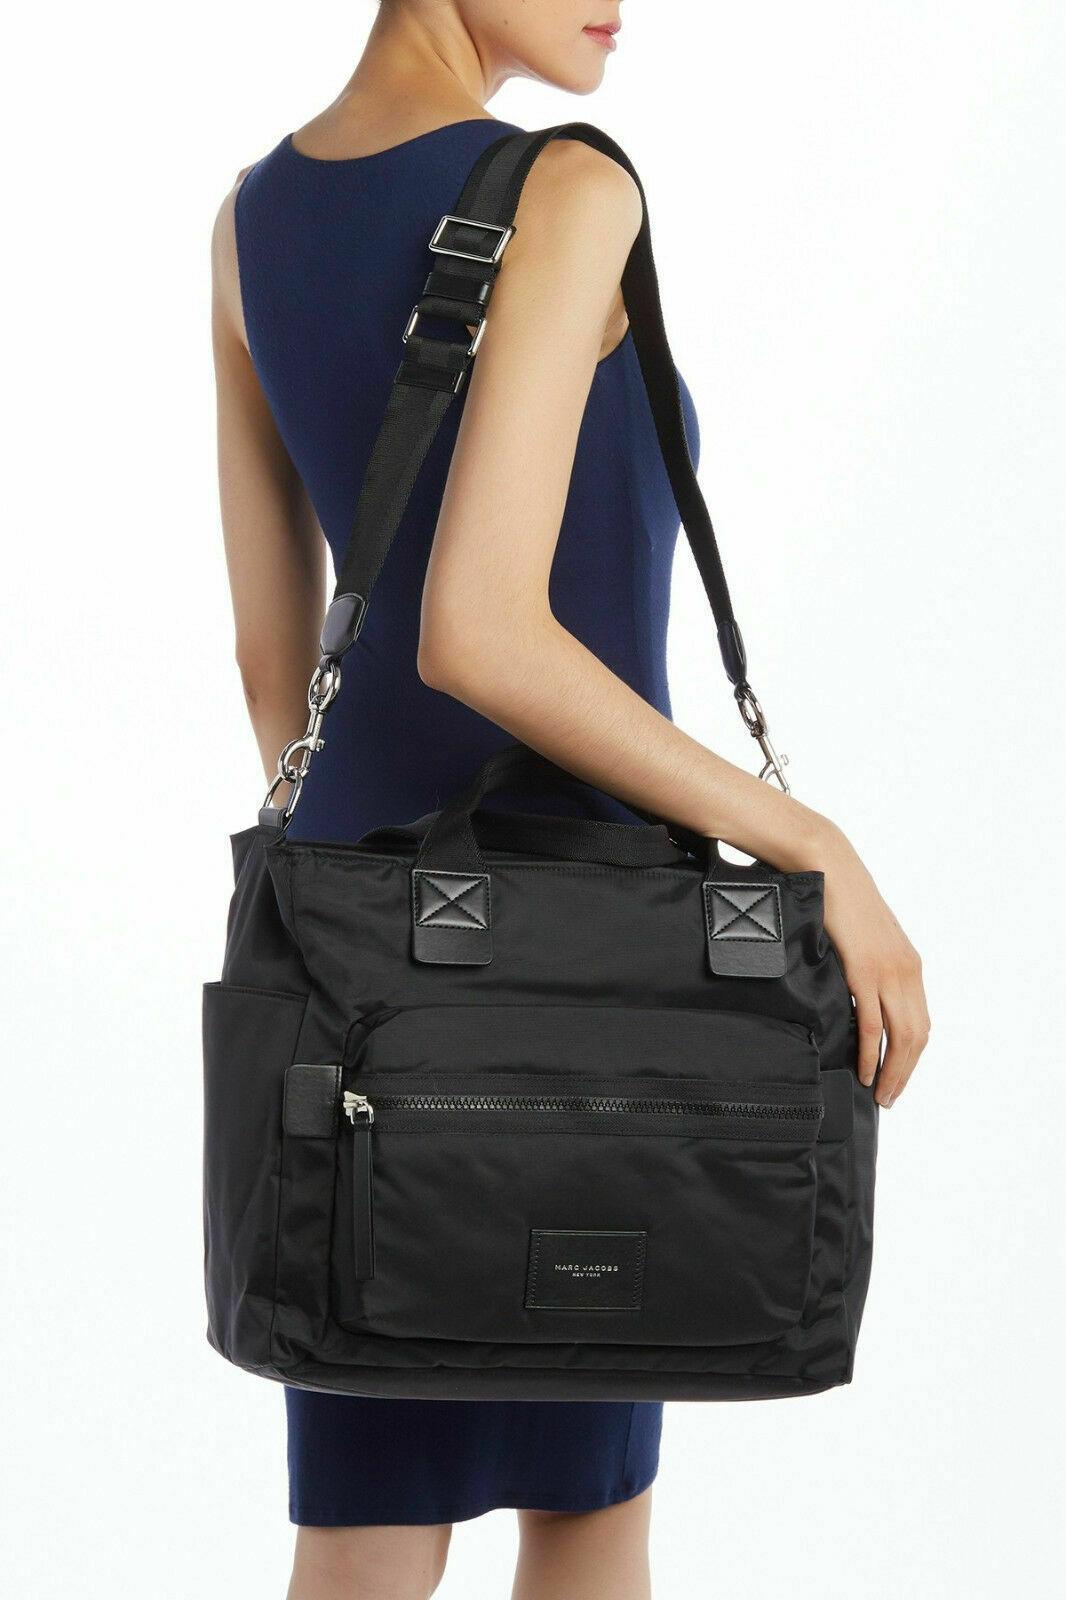 88157626c4f13c Marc Jacobs Biker Nylon Baby Bag Black - BRAND NEW FACTORY SEALED - MSRP  $310